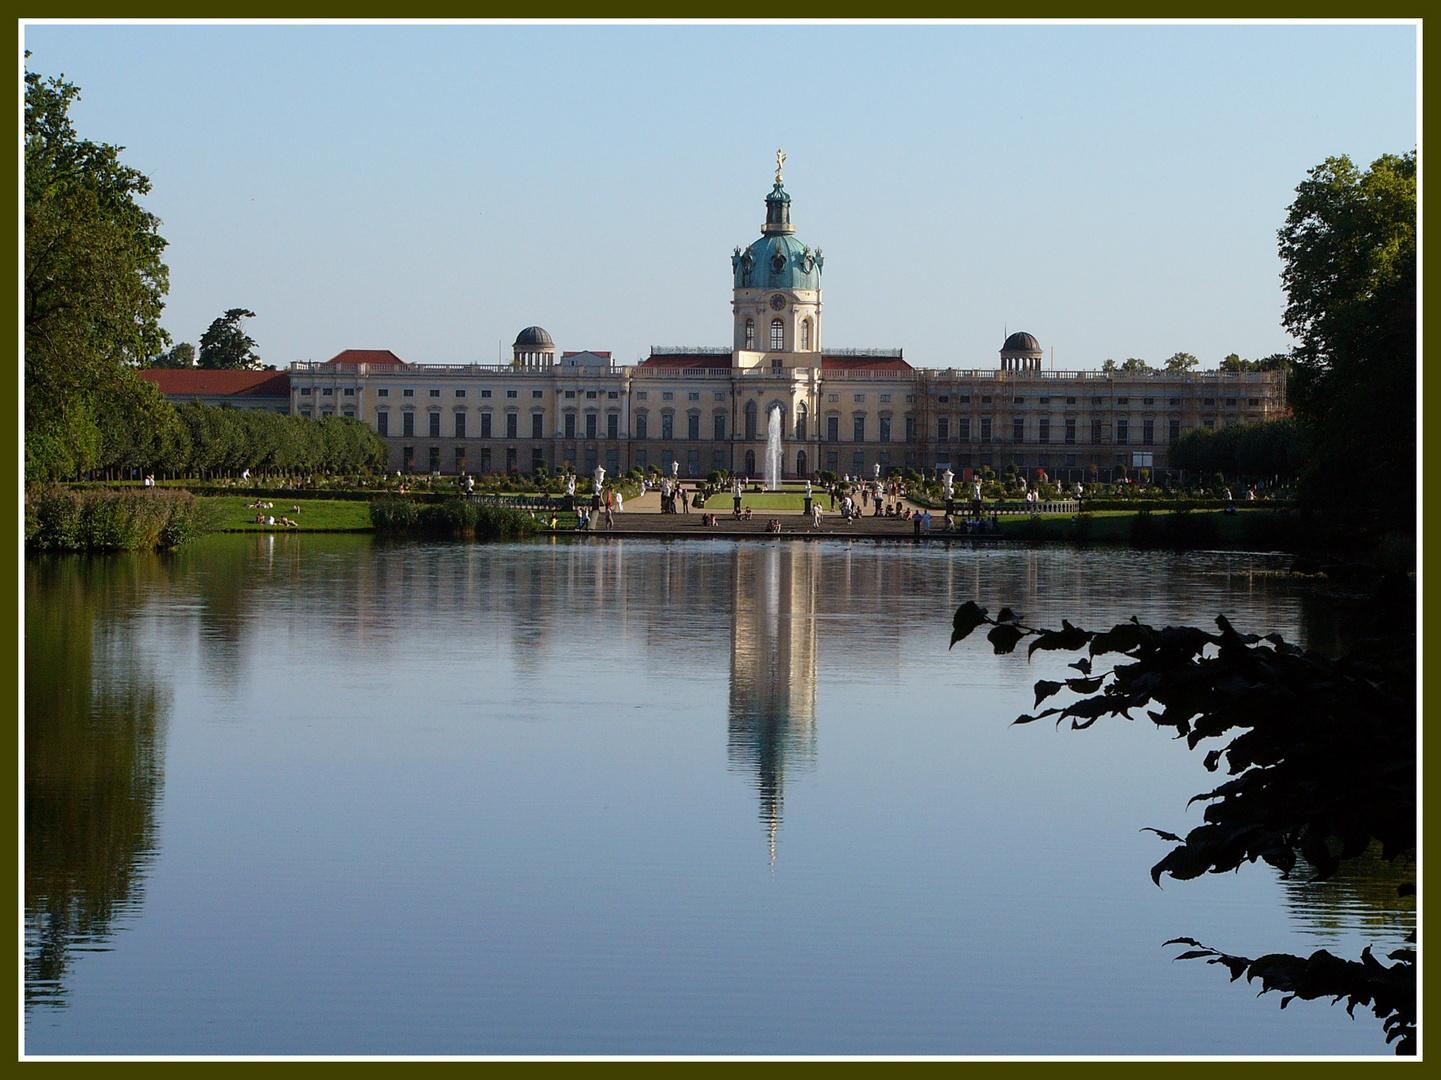 Palacio de Charlottenburg - Berlín